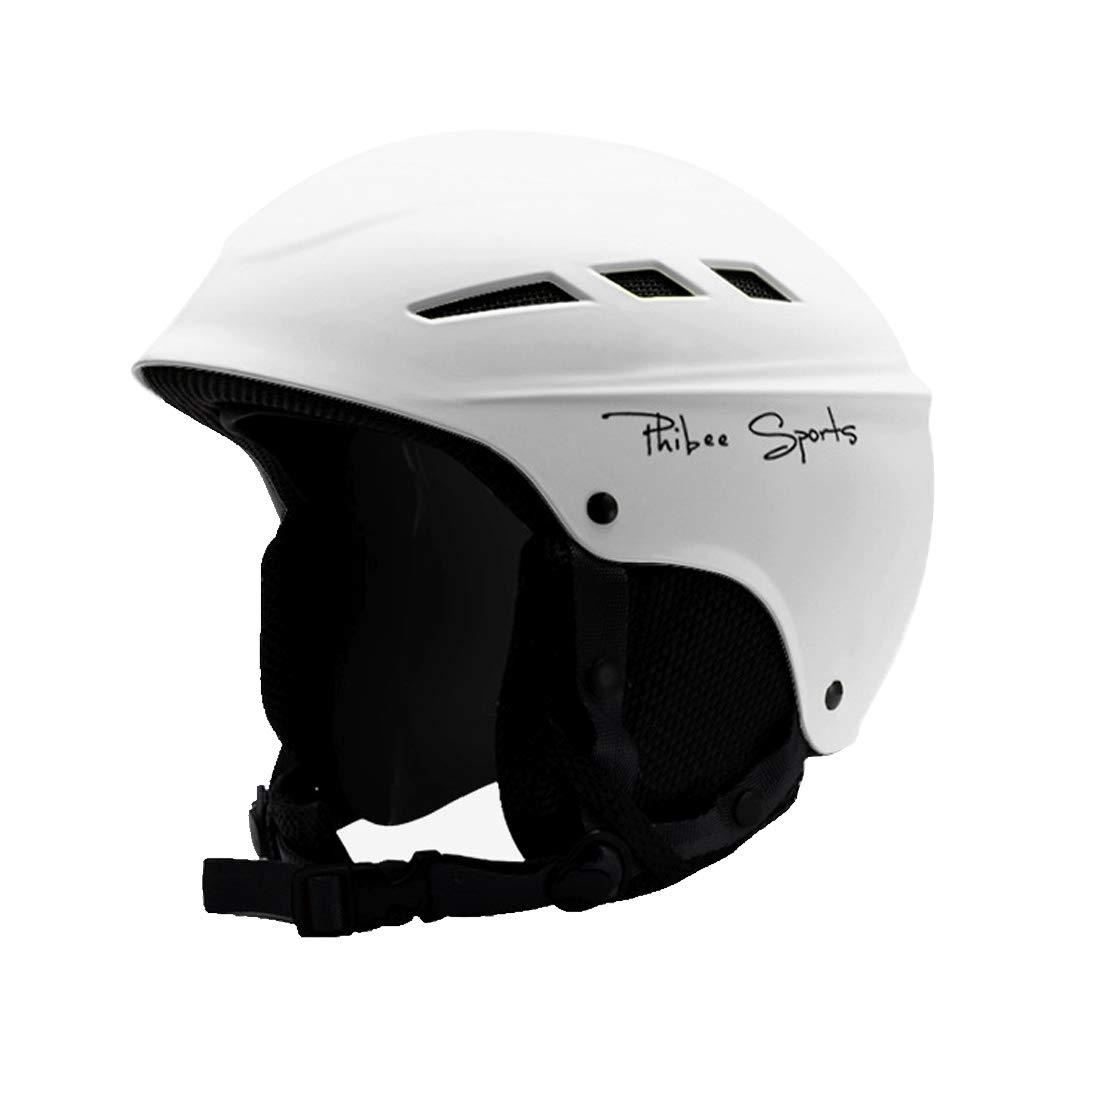 LYL 56-60cmにフィット、サイズ:M、個人用および二価のプレートスキープロフェッショナル保護用ヘルメット8通気孔PCシェル調整可能バックル親子保護用ヘルメット   B07NPV4CTK